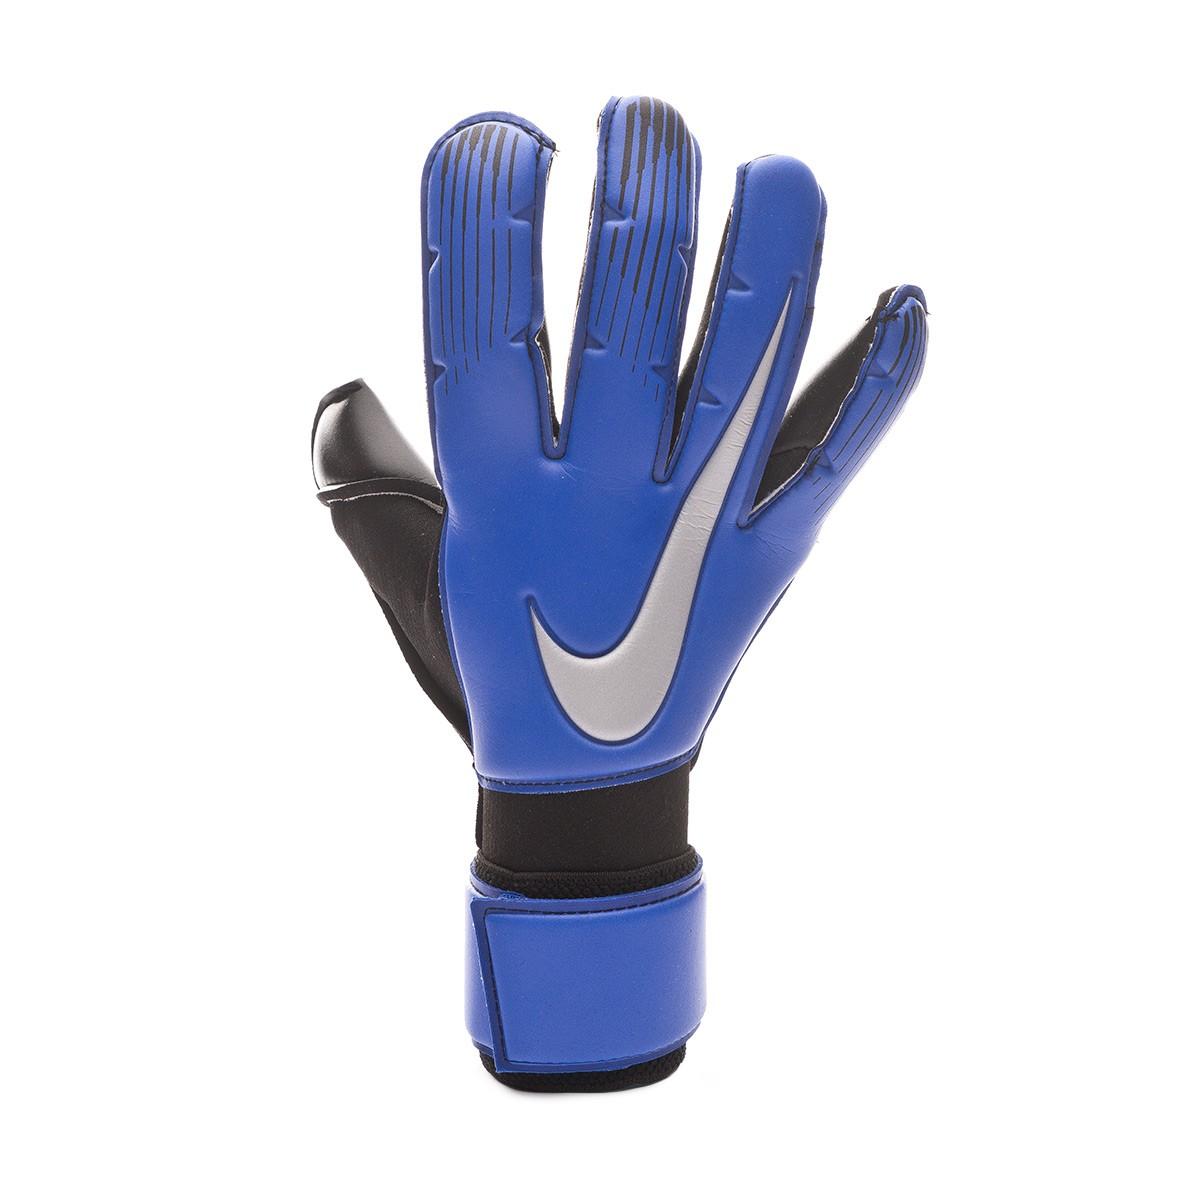 4a5e7c405 Glove Nike Vapor Grip 3 RS Promo Racer blue-Black-Metallic silver - Football  store Fútbol Emotion